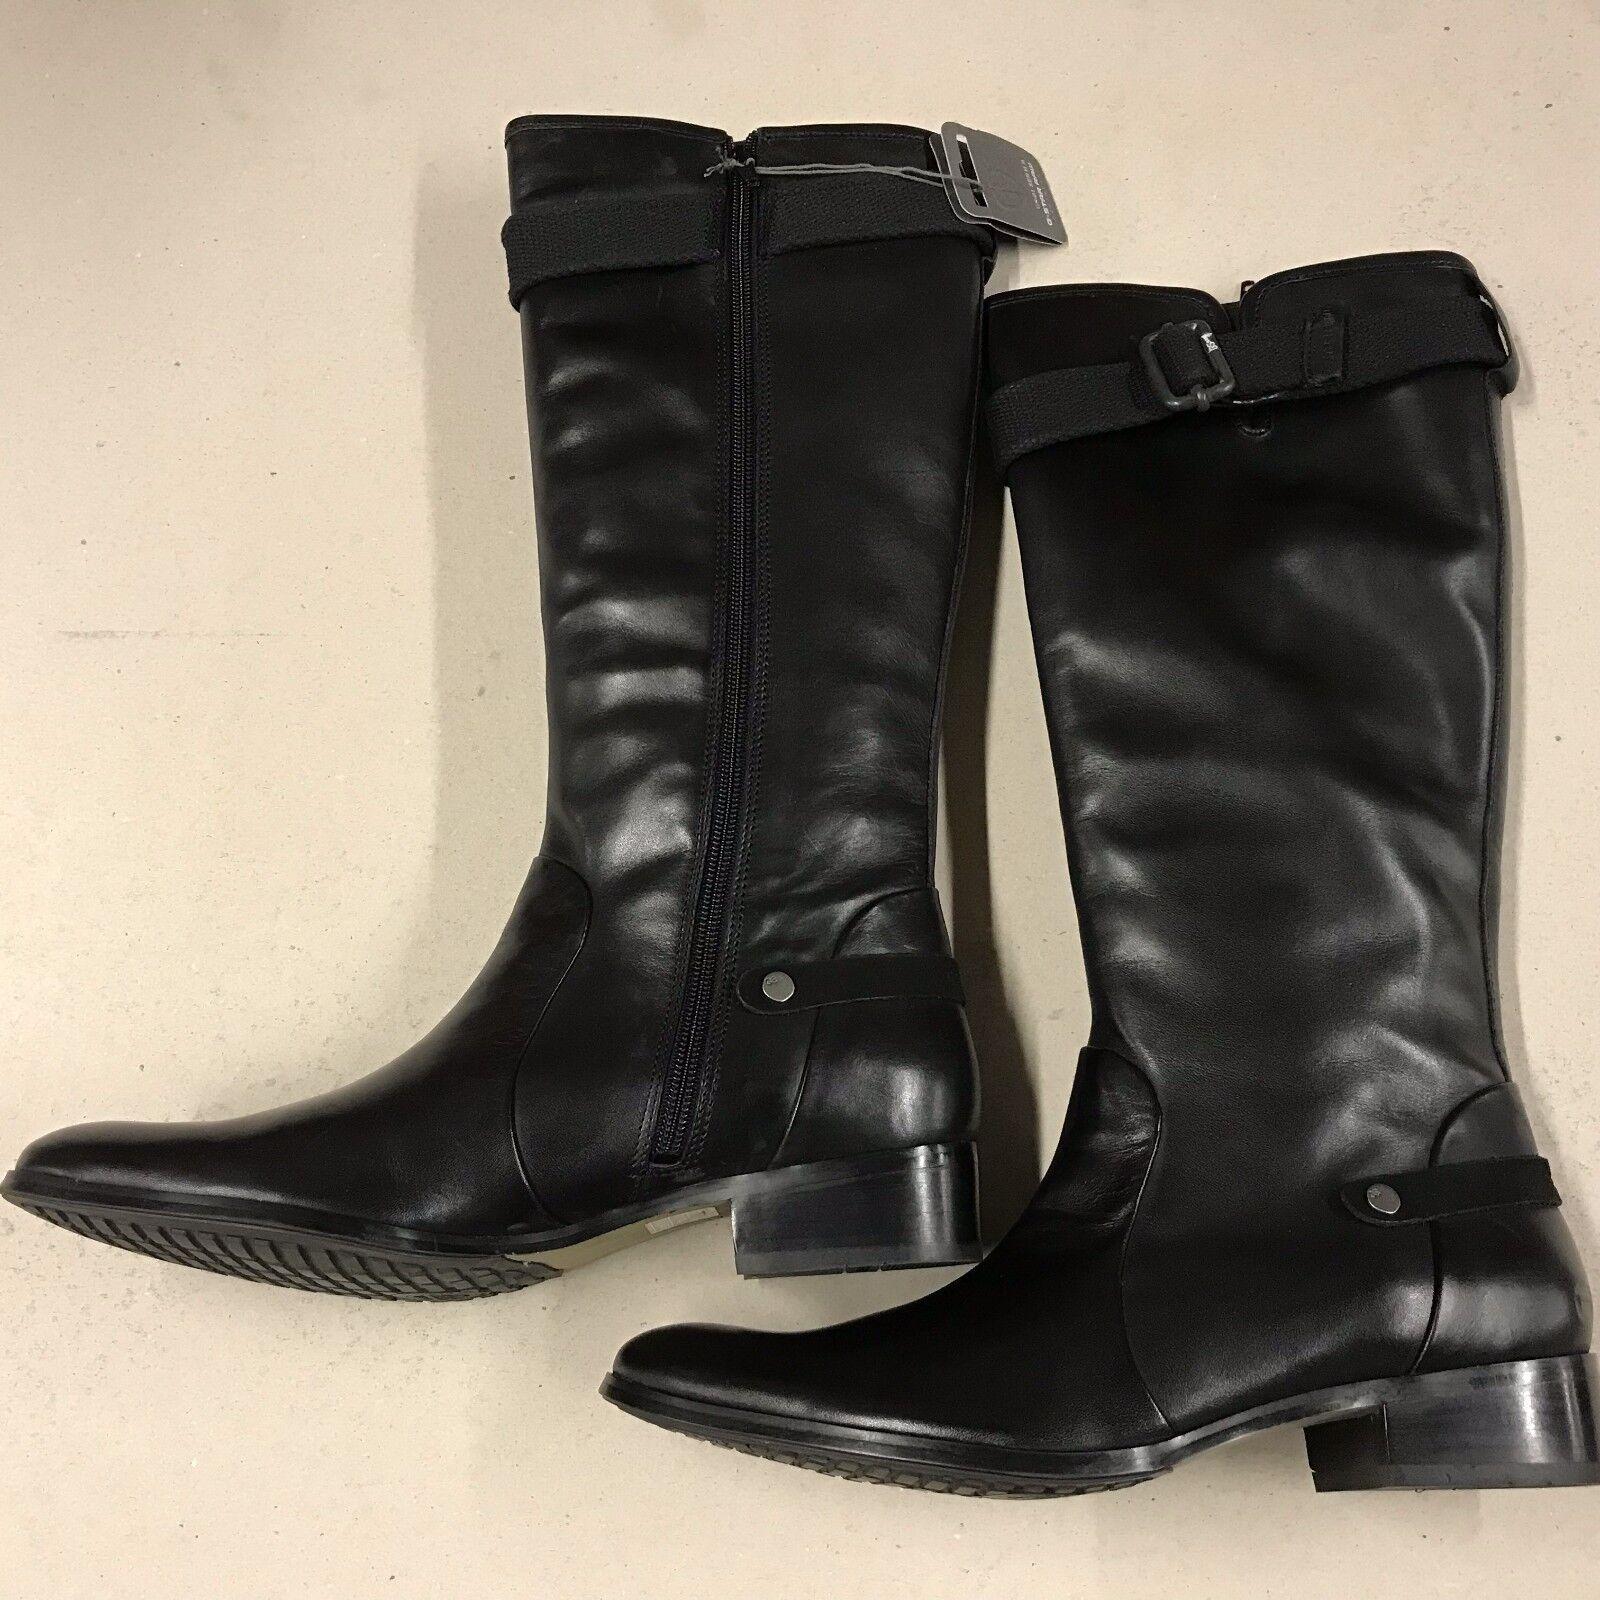 G Hebilla Star Raw Negro Knee High bota Cuero Hebilla G Detalle Talla 5 Ganga 865556